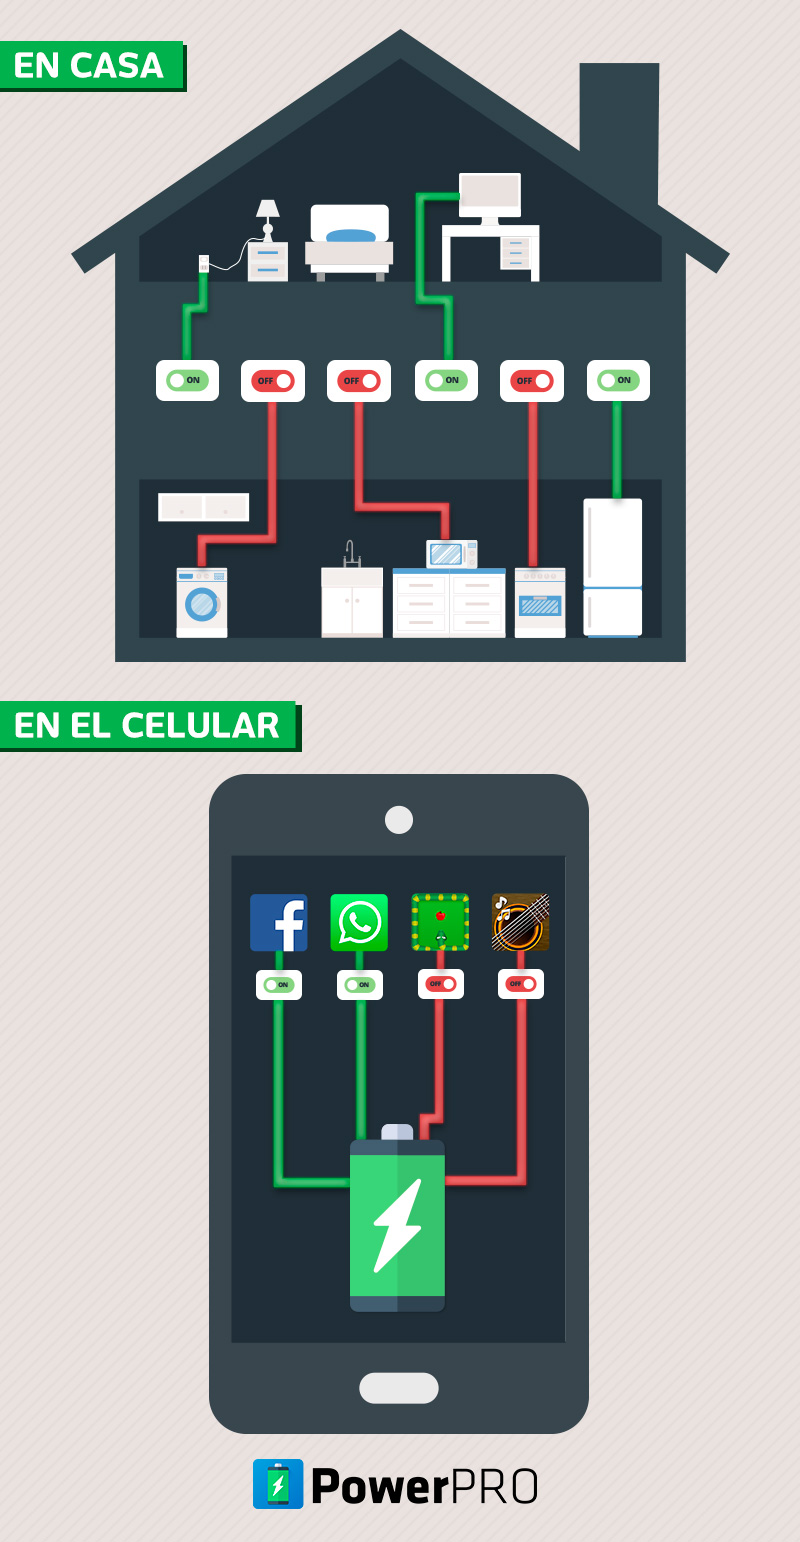 infografico powerpro español